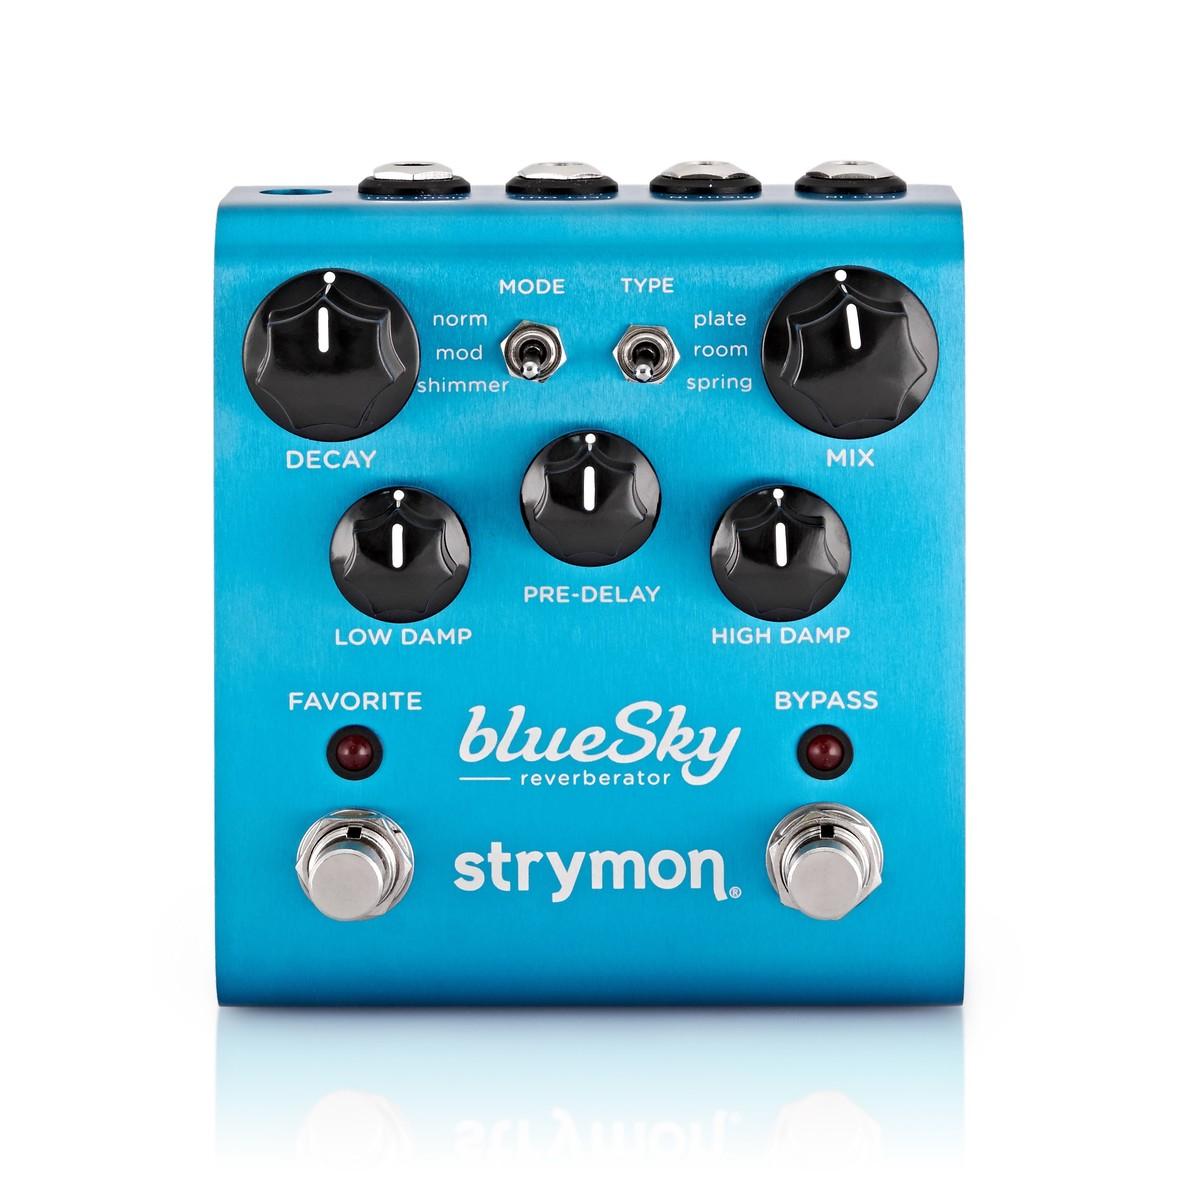 strymon blue sky reverberator at gear4music. Black Bedroom Furniture Sets. Home Design Ideas